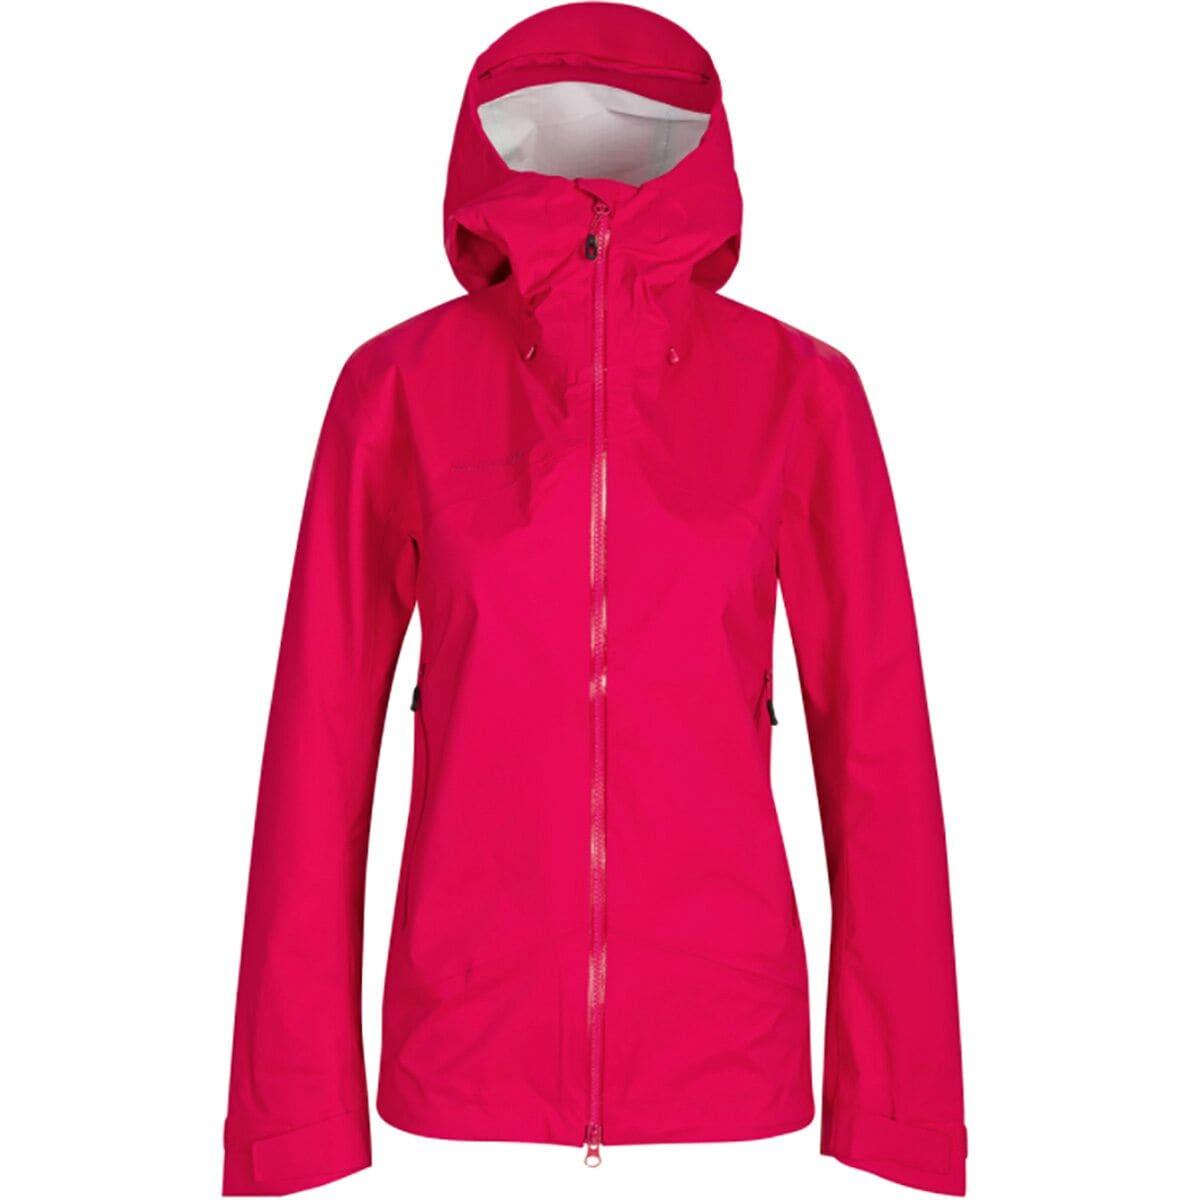 Kento HS Hooded Jacket - Women